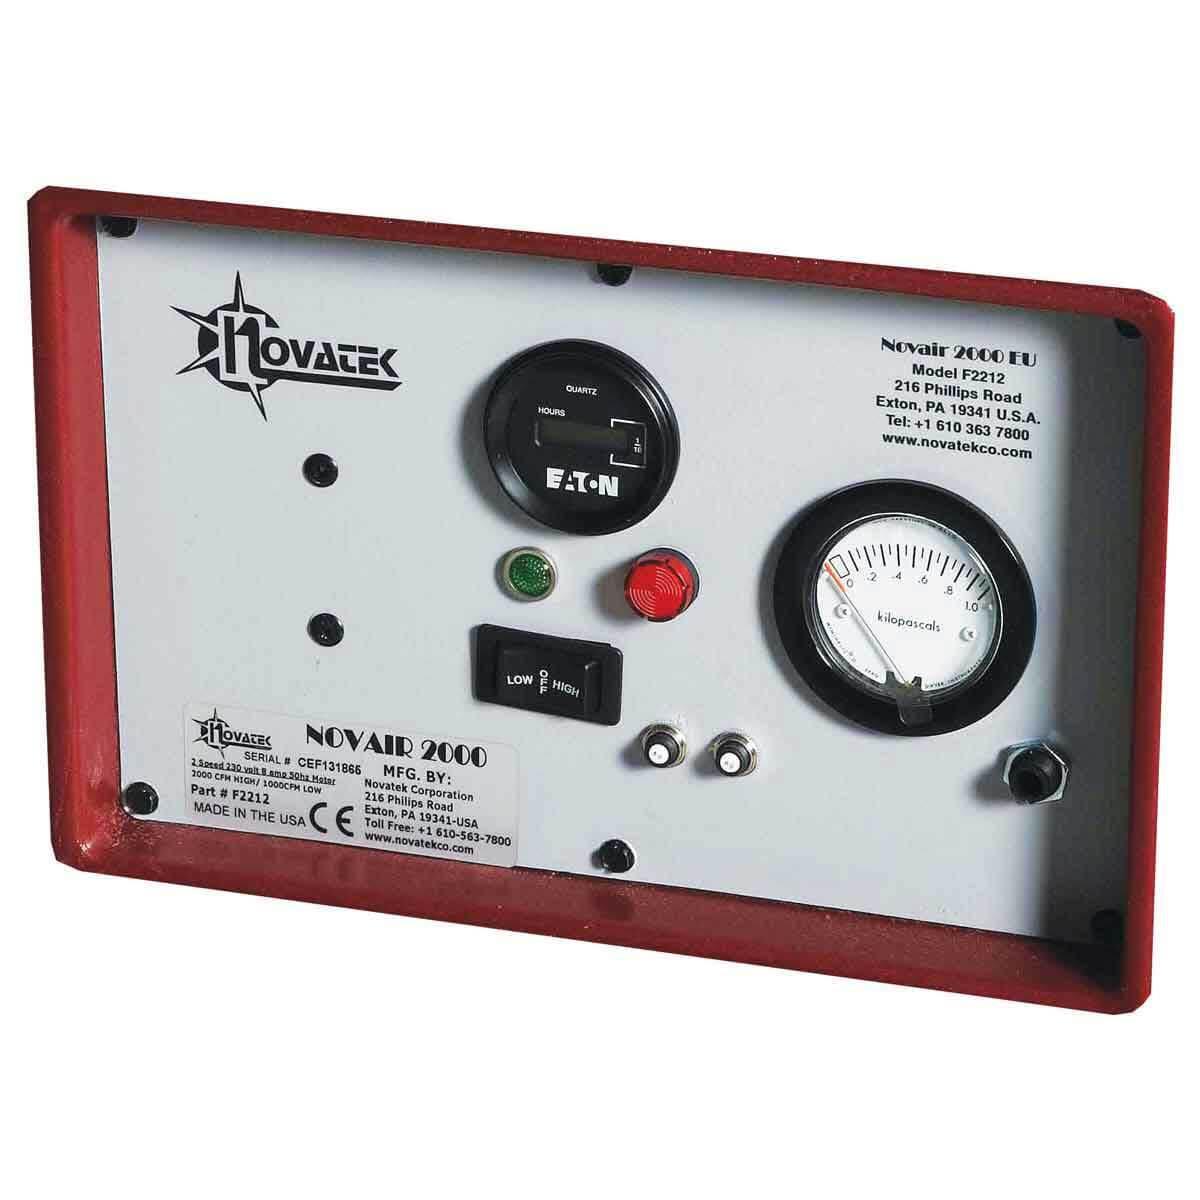 Novair 2000 Control Panel